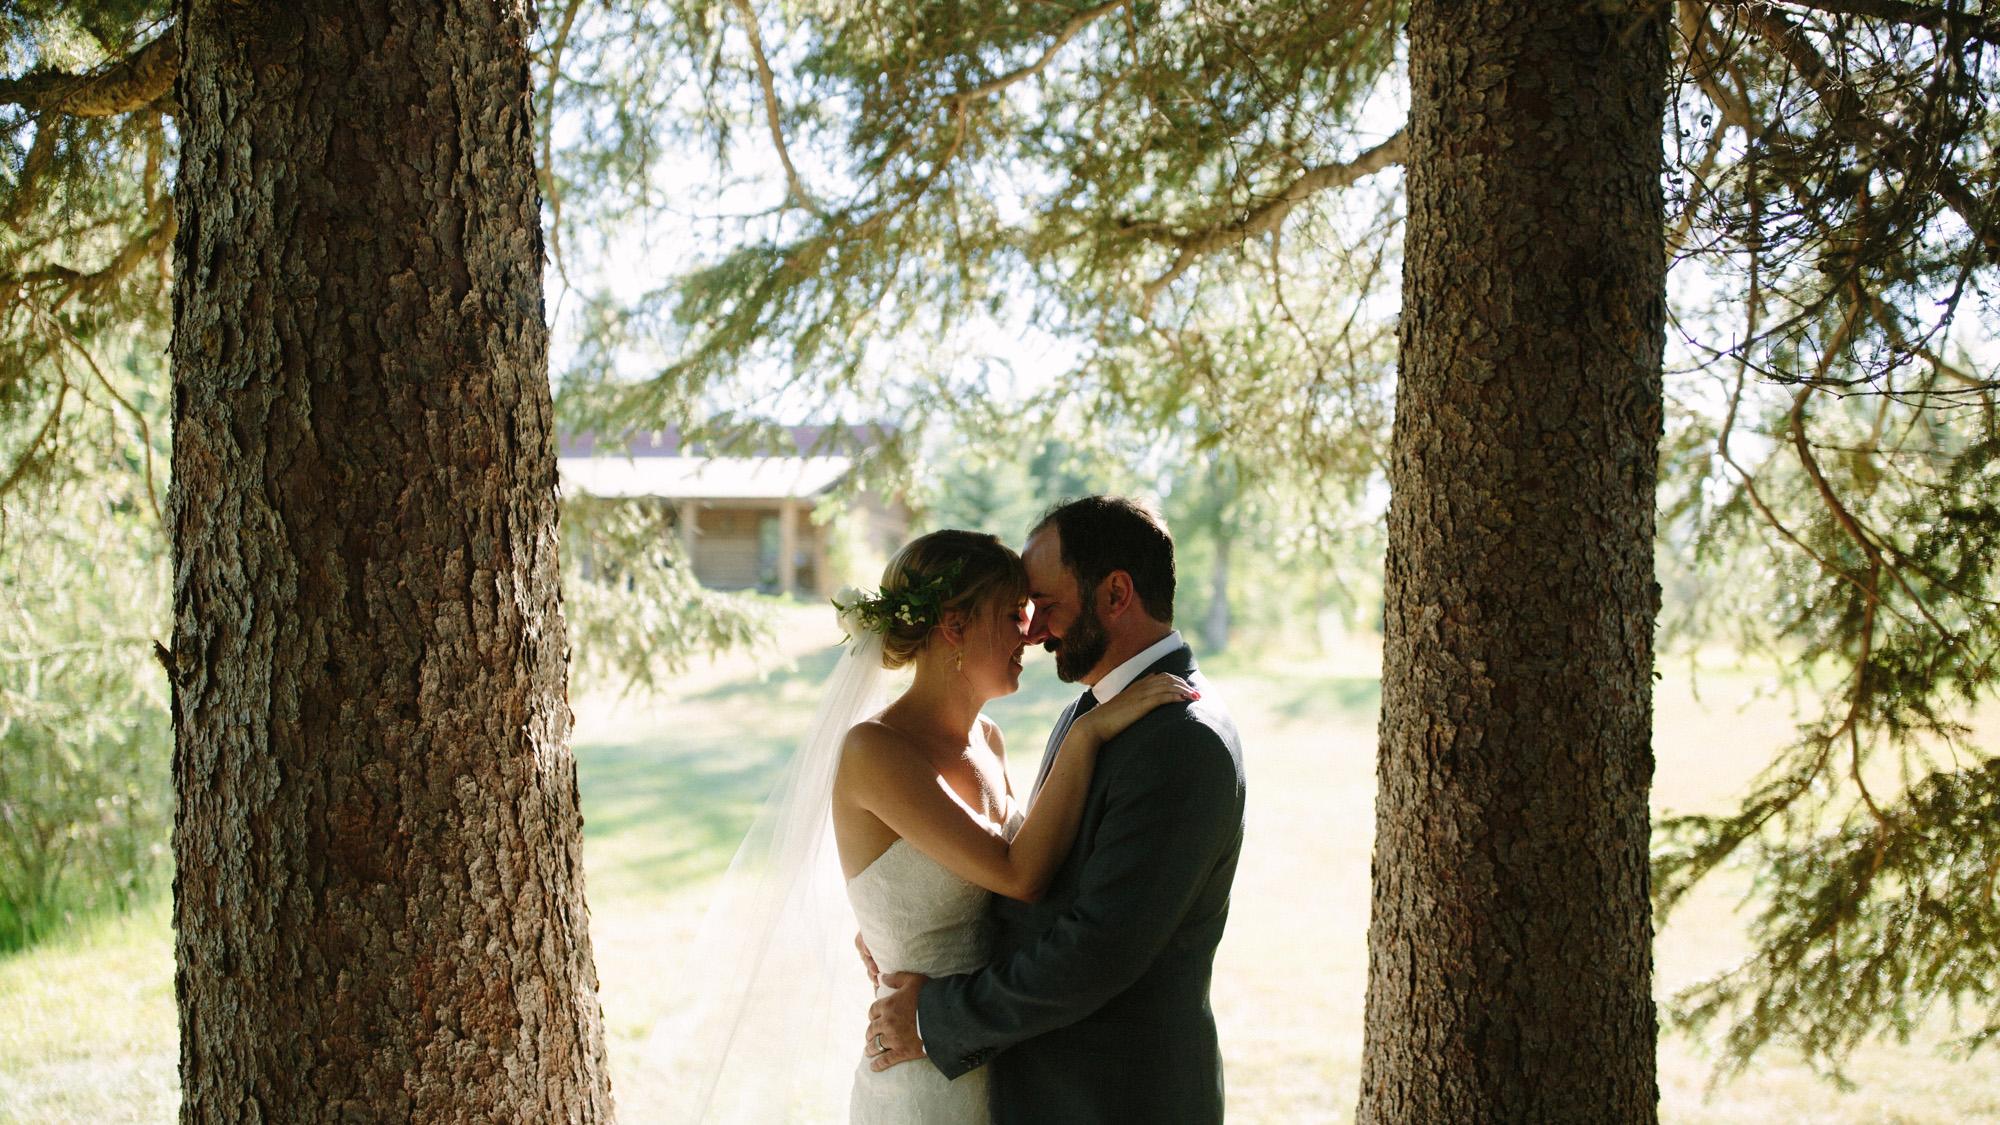 Montana_Wedding_Photos_alec_vanderboom-0109.jpg